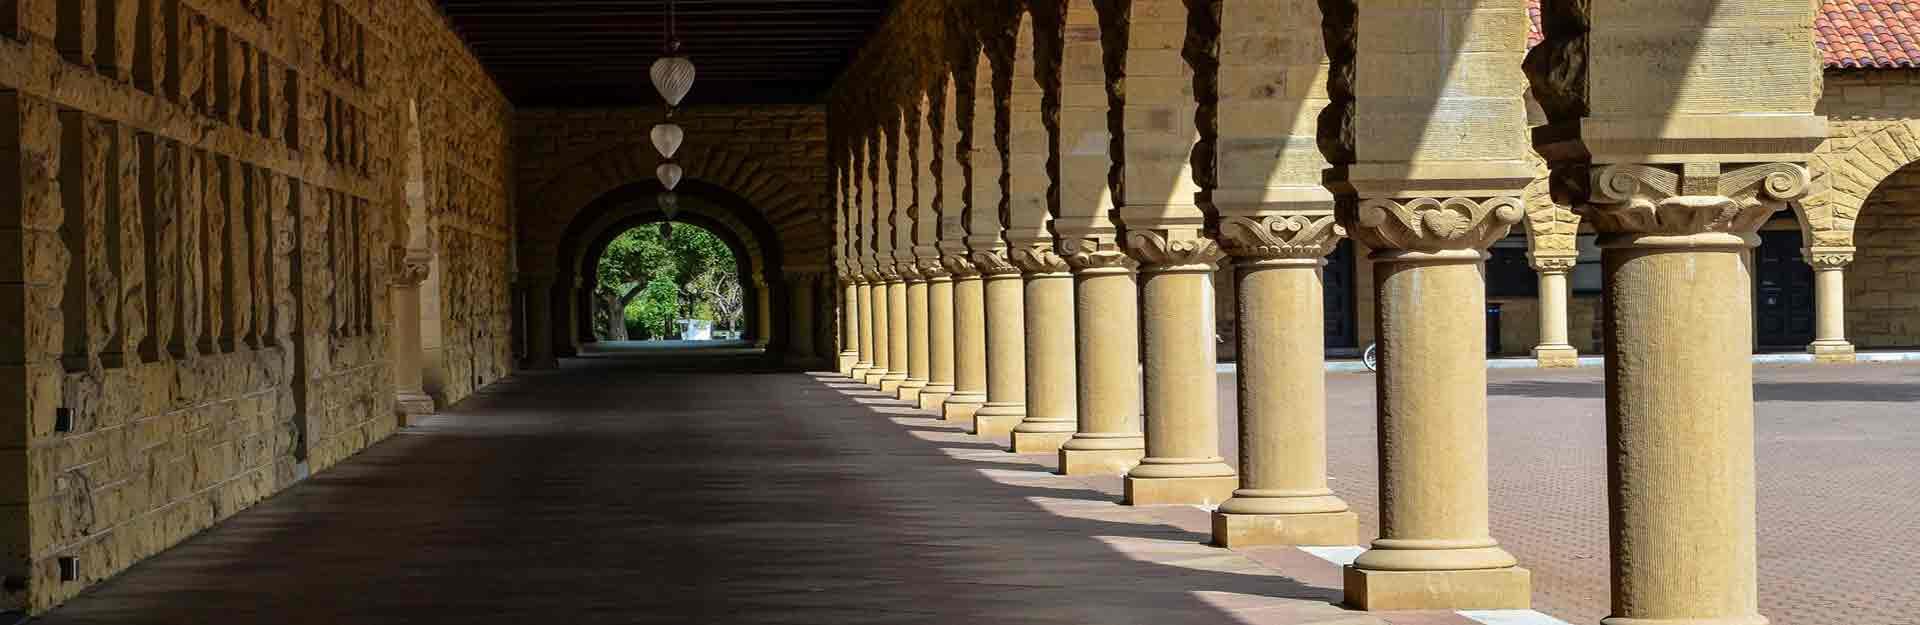 Palo Alto, California (USA) – June 12, 2013: Pillared Corridor i